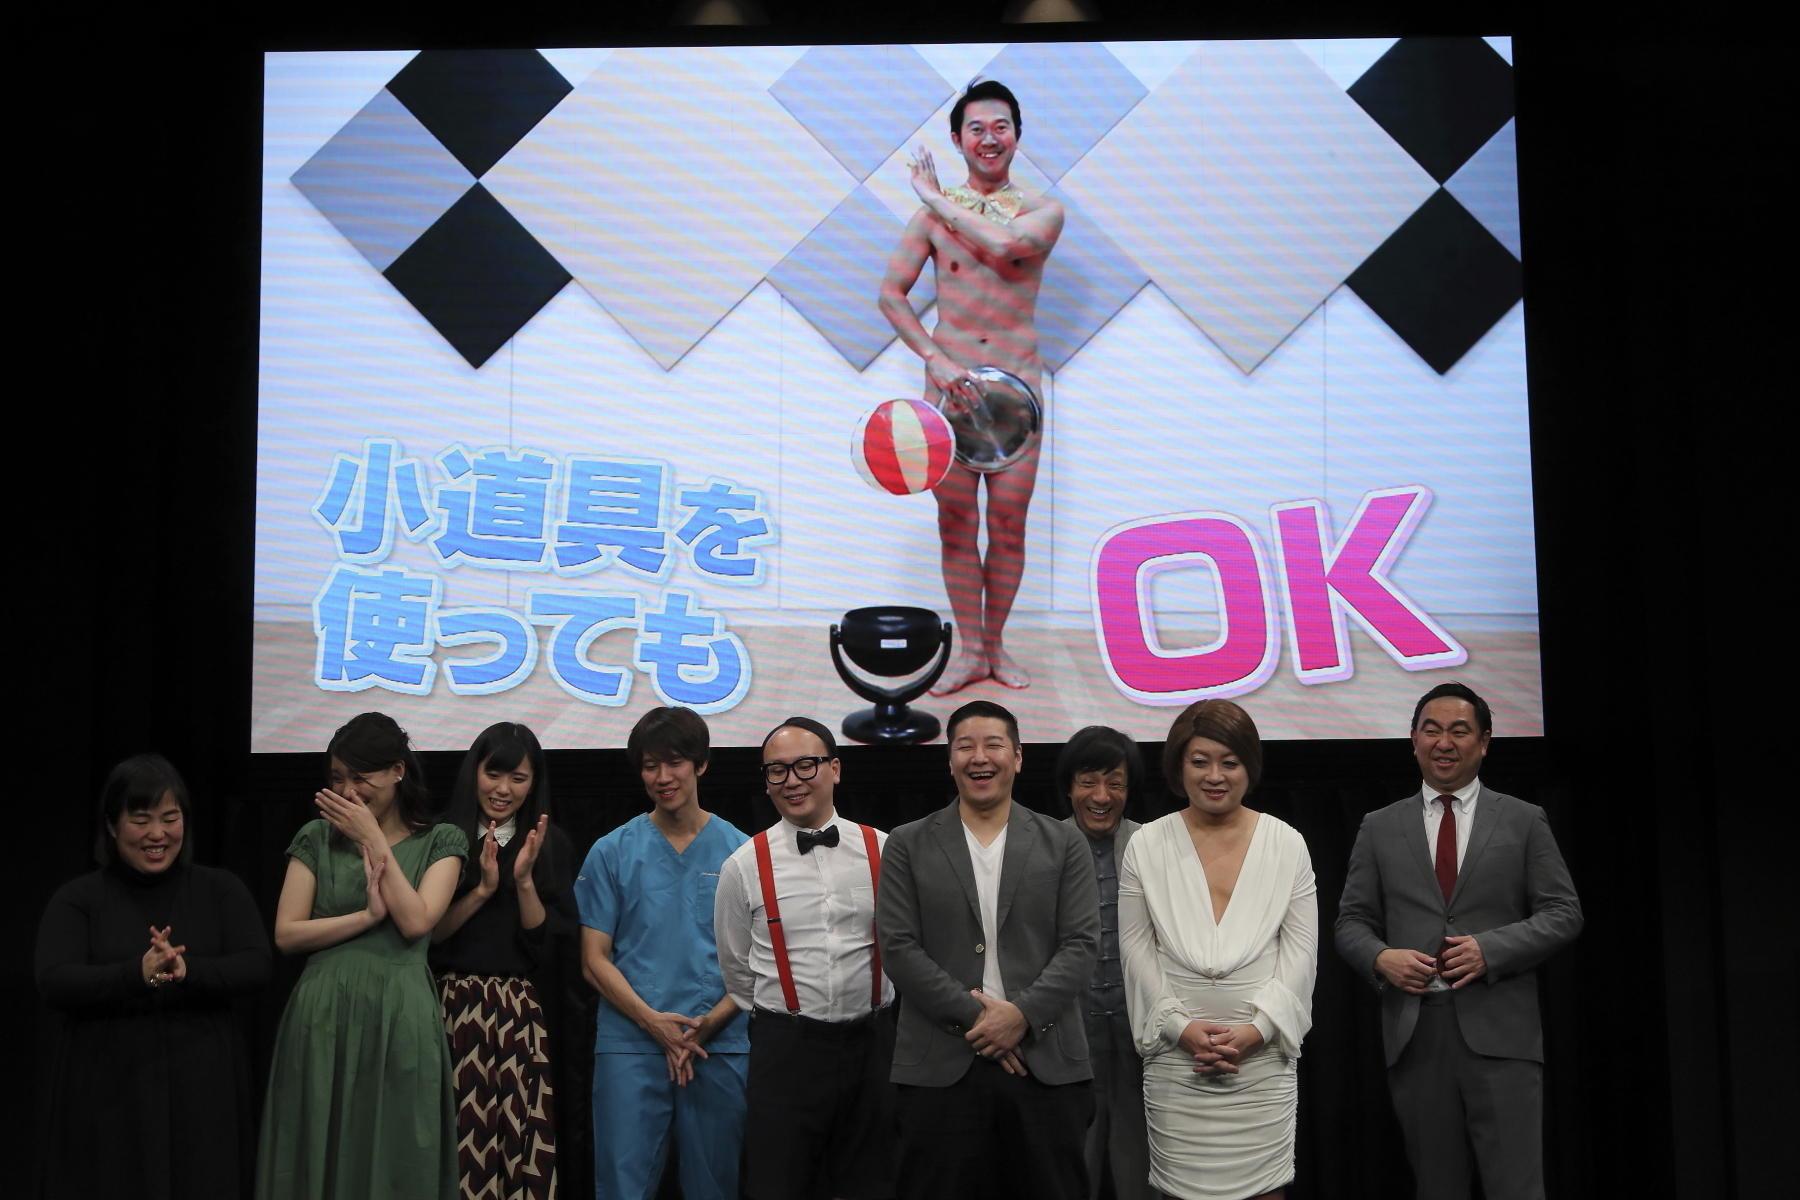 http://news.yoshimoto.co.jp/20181130143020-ef1521641a3a7abb48c3aecd5ed165ec13d1ed0c.jpg